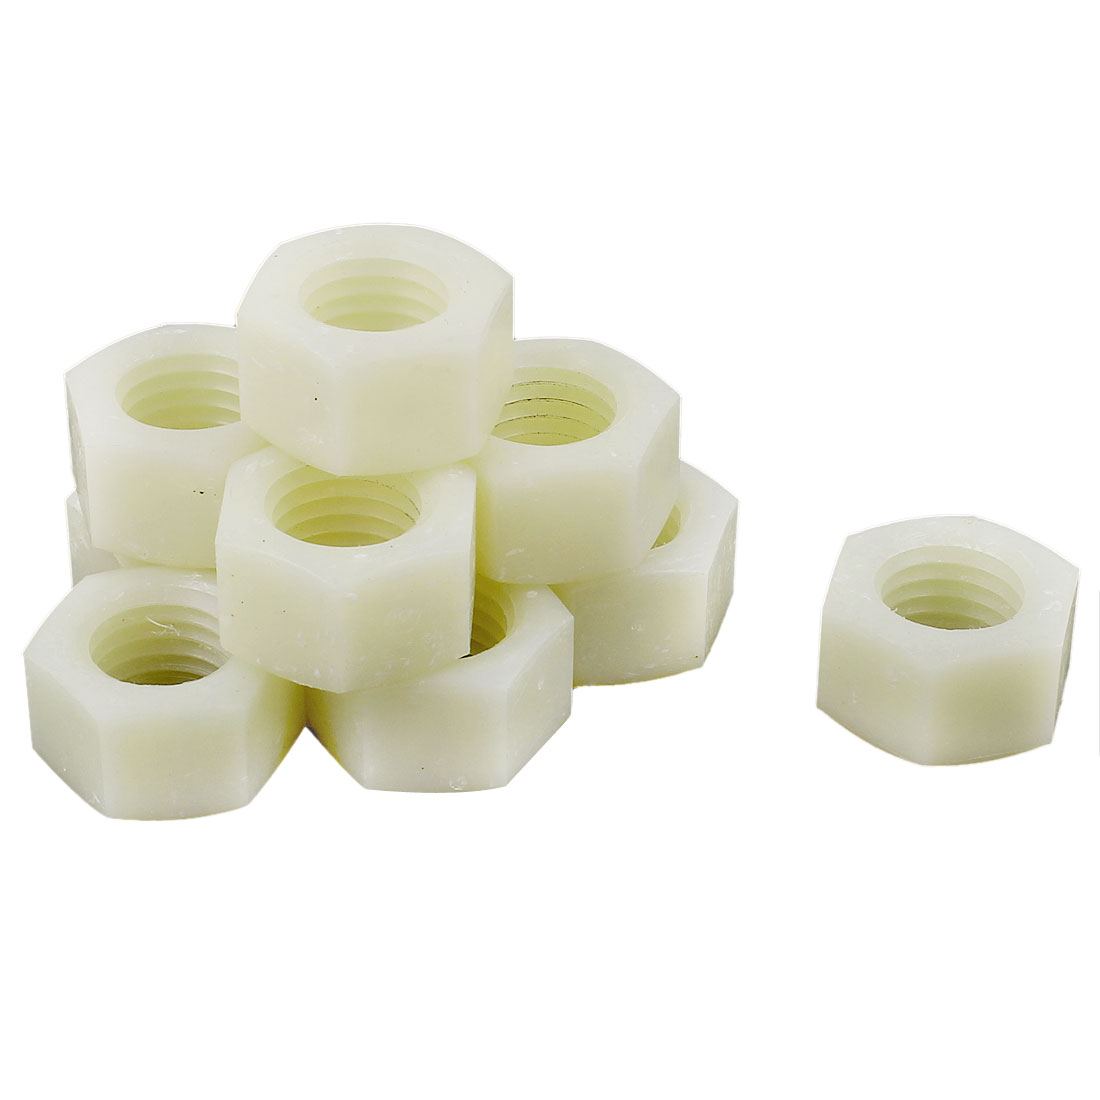 10pcs Metric M17x2.5mm Nylon Hexagon Fastener Hex Full Nuts White